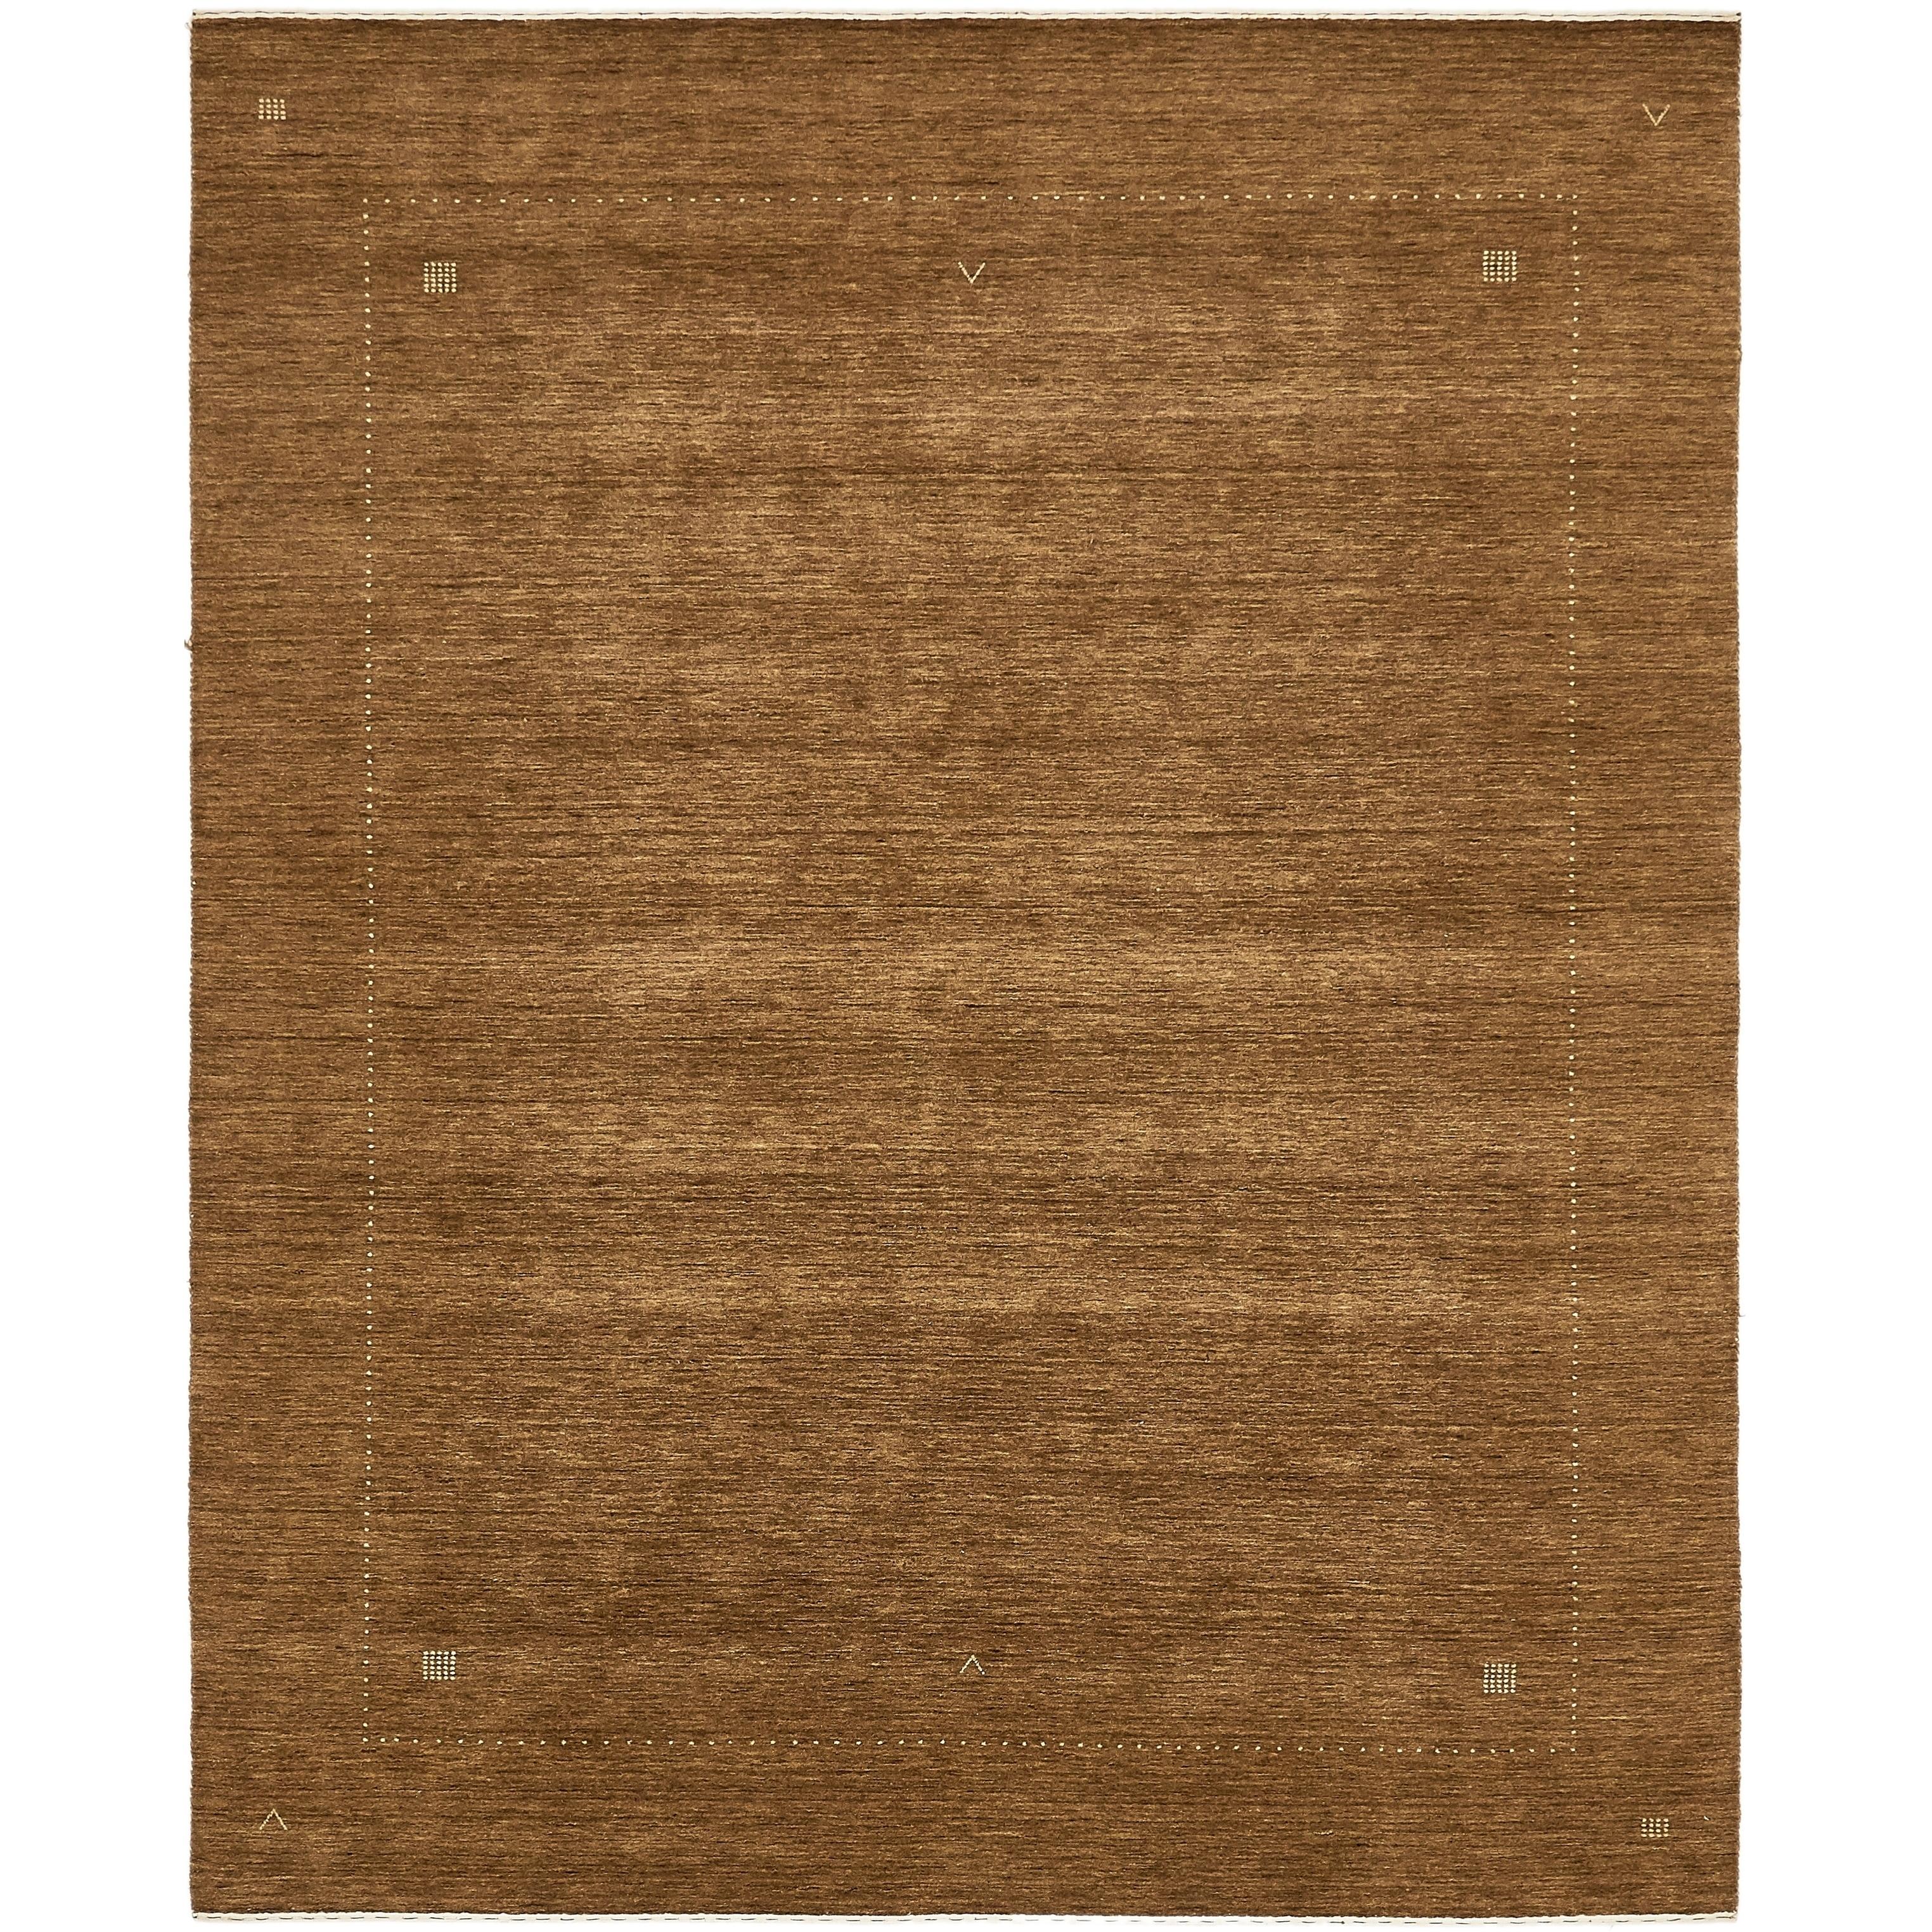 Hand Knotted Kashkuli Gabbeh Wool Area Rug - 8 2 x 10 (Brown - 8 2 x 10)